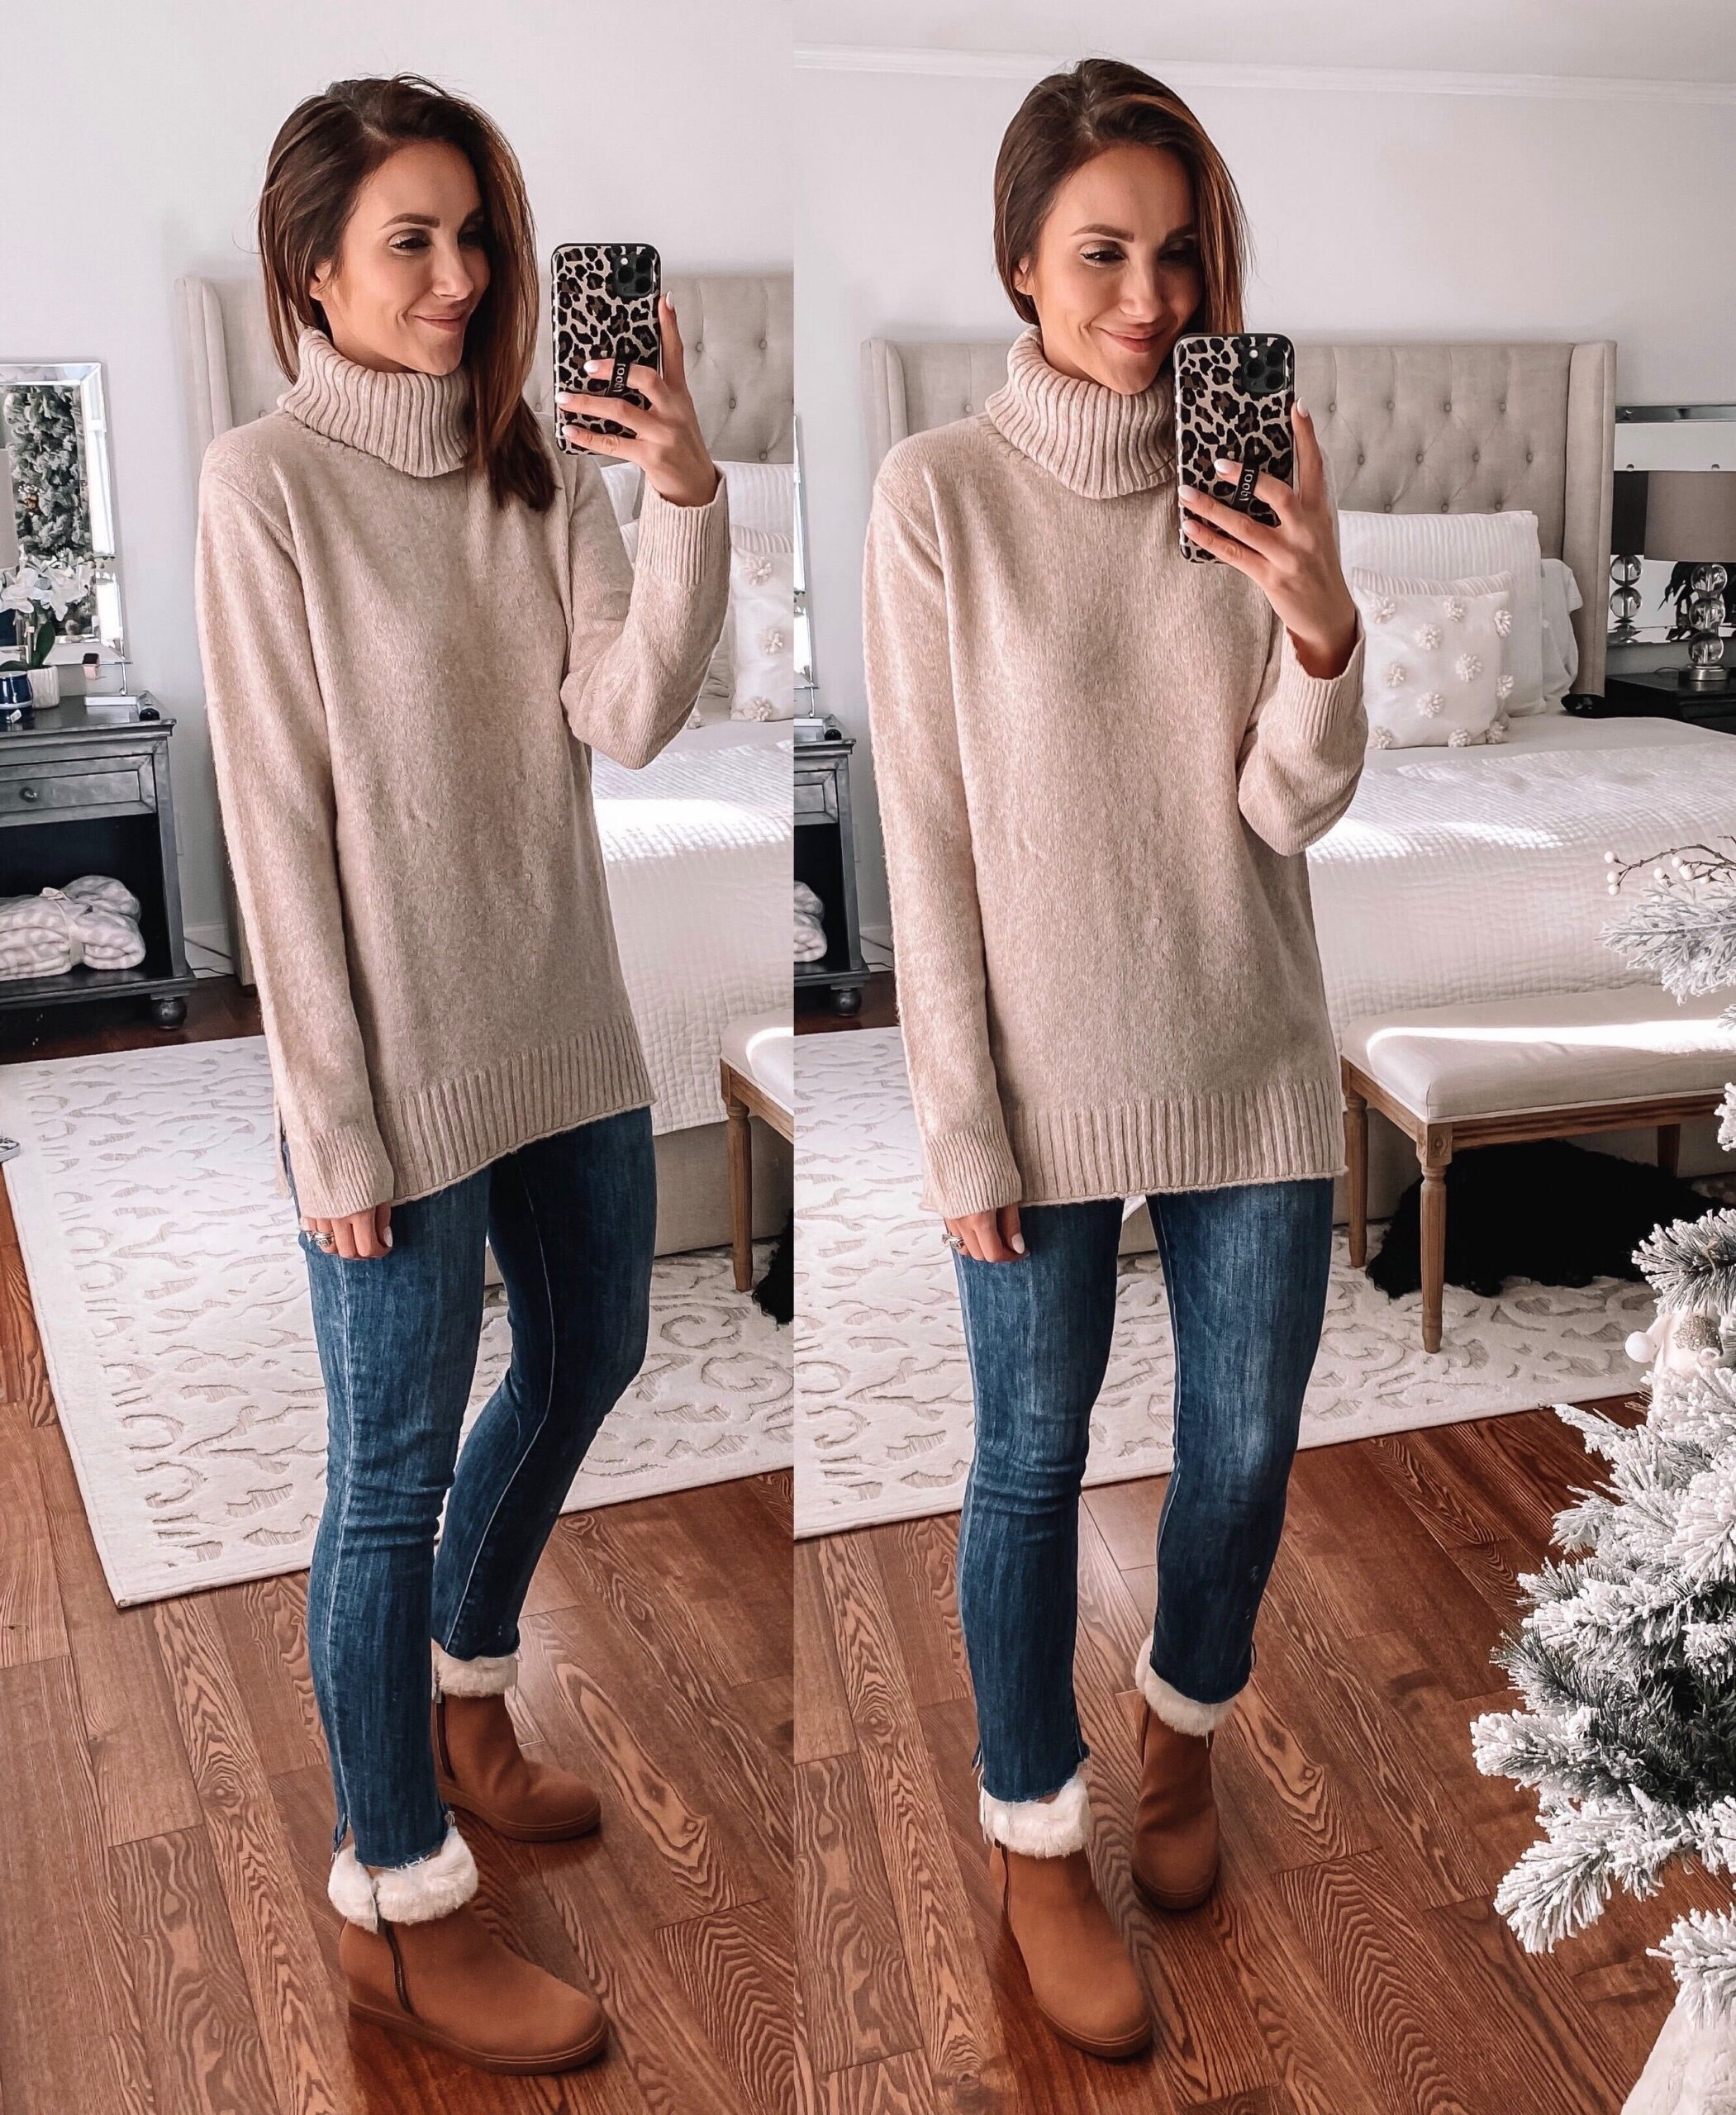 turtleneck sweater, faux fur booties